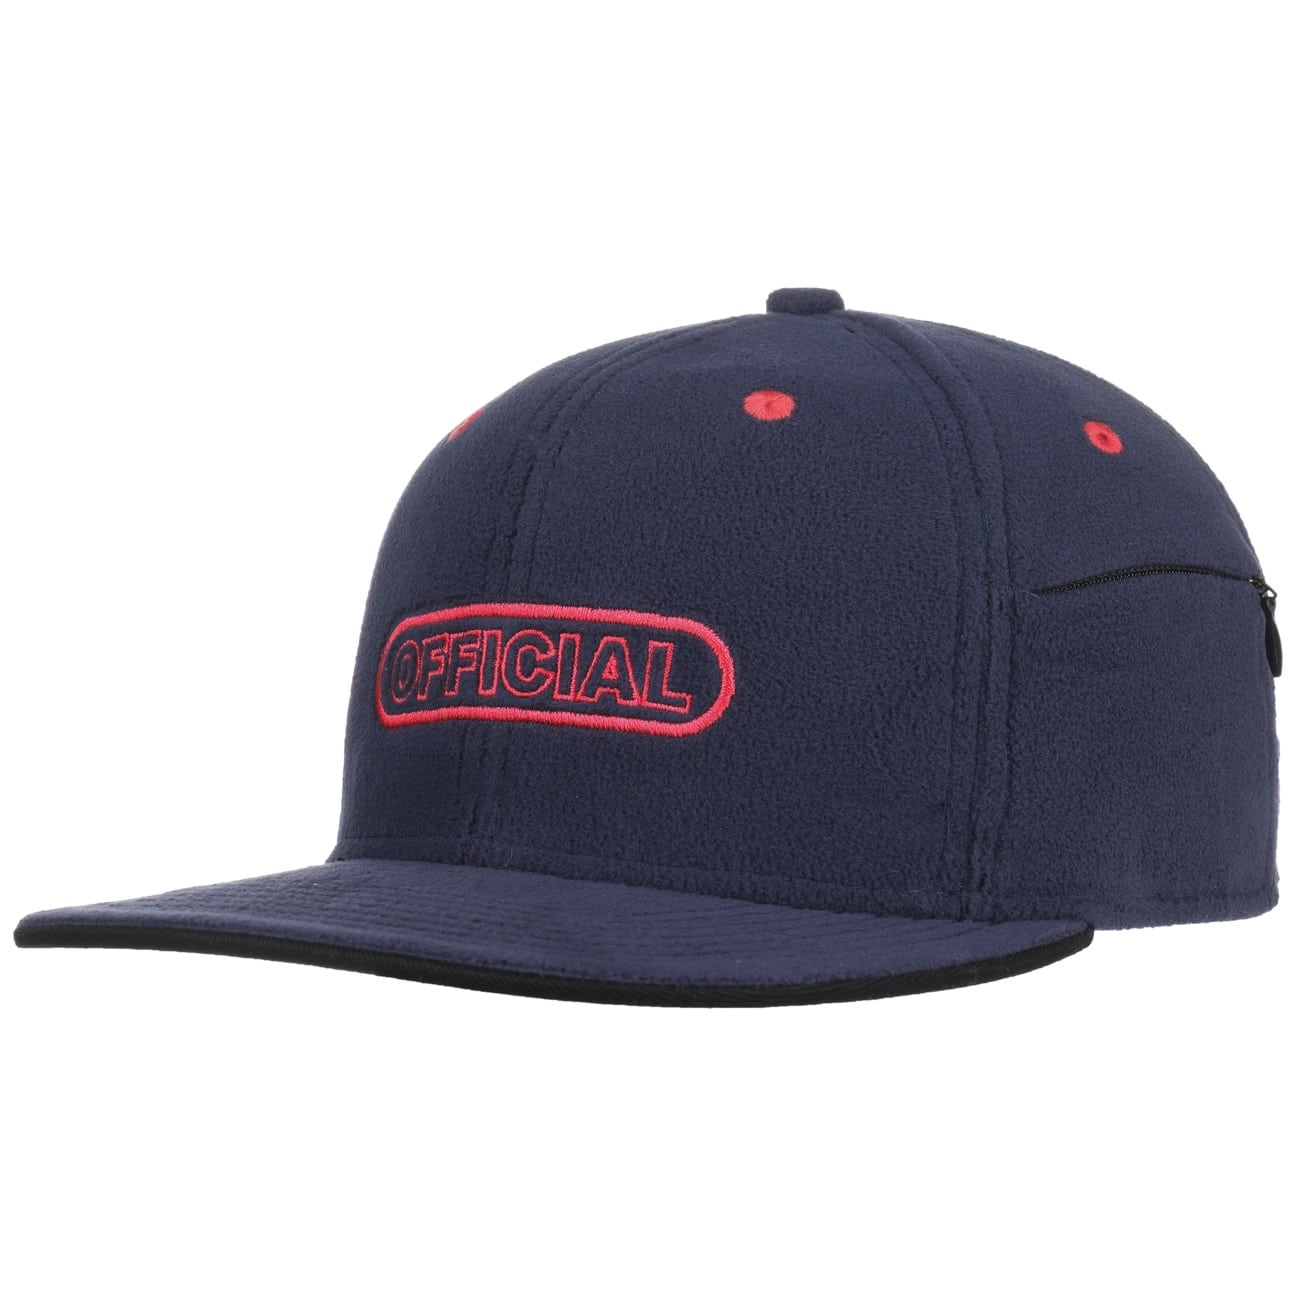 Casquette Blackslope by Official Headwear  baseball cap